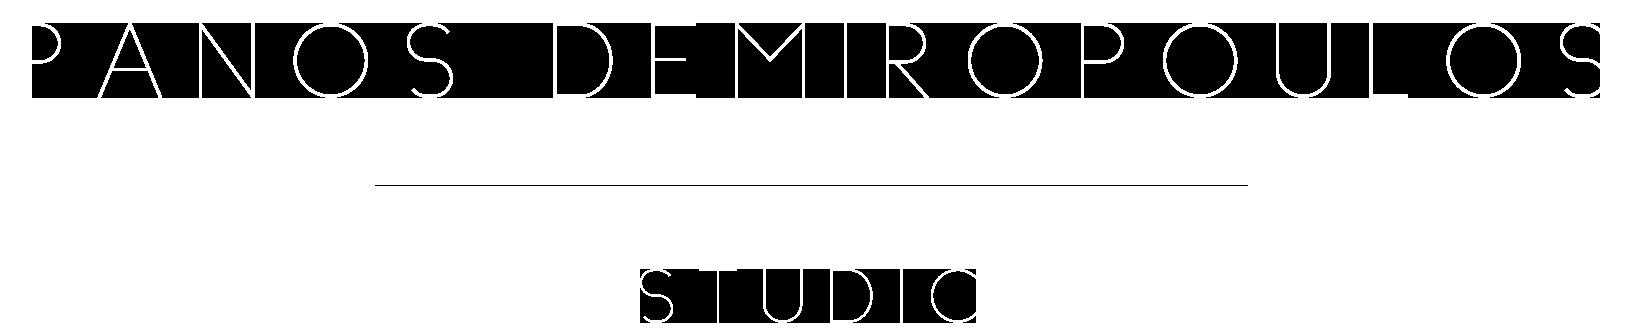 PANOS   DEMIROPOULOS   STUDIO